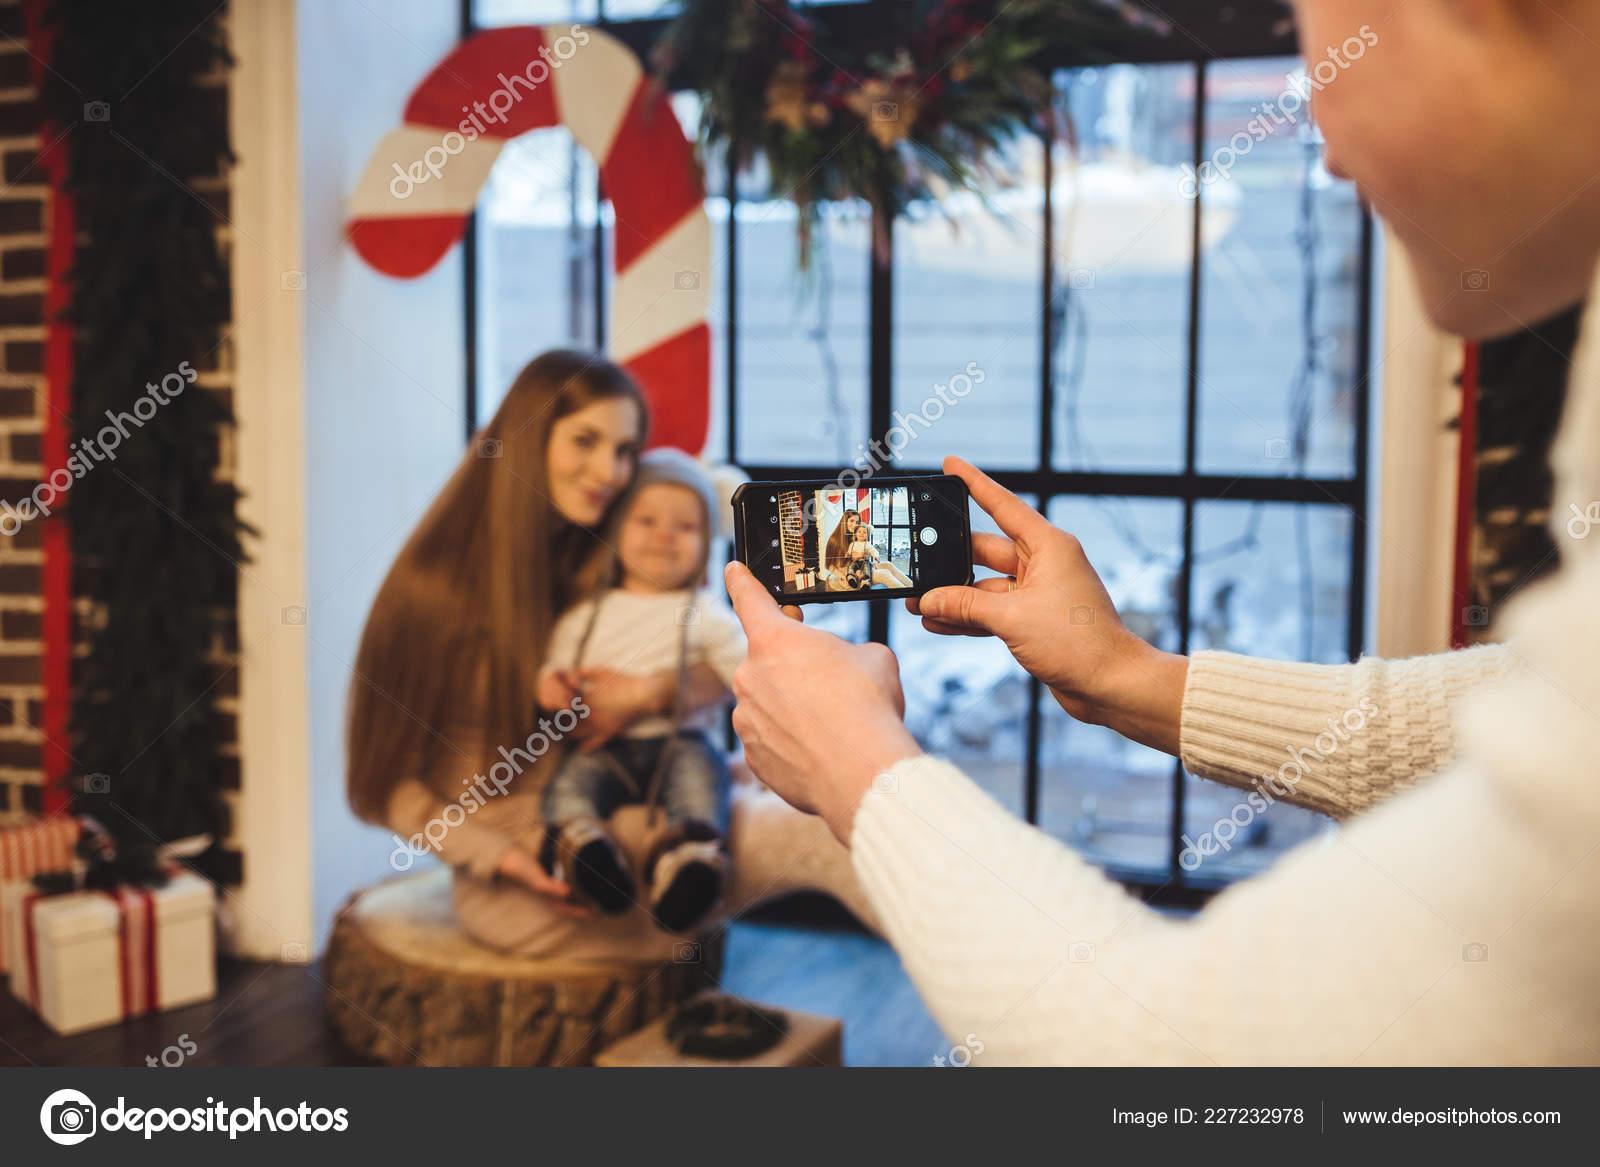 Theme Mobile Photography Amateur Photo Video Phone Hands Caucasian